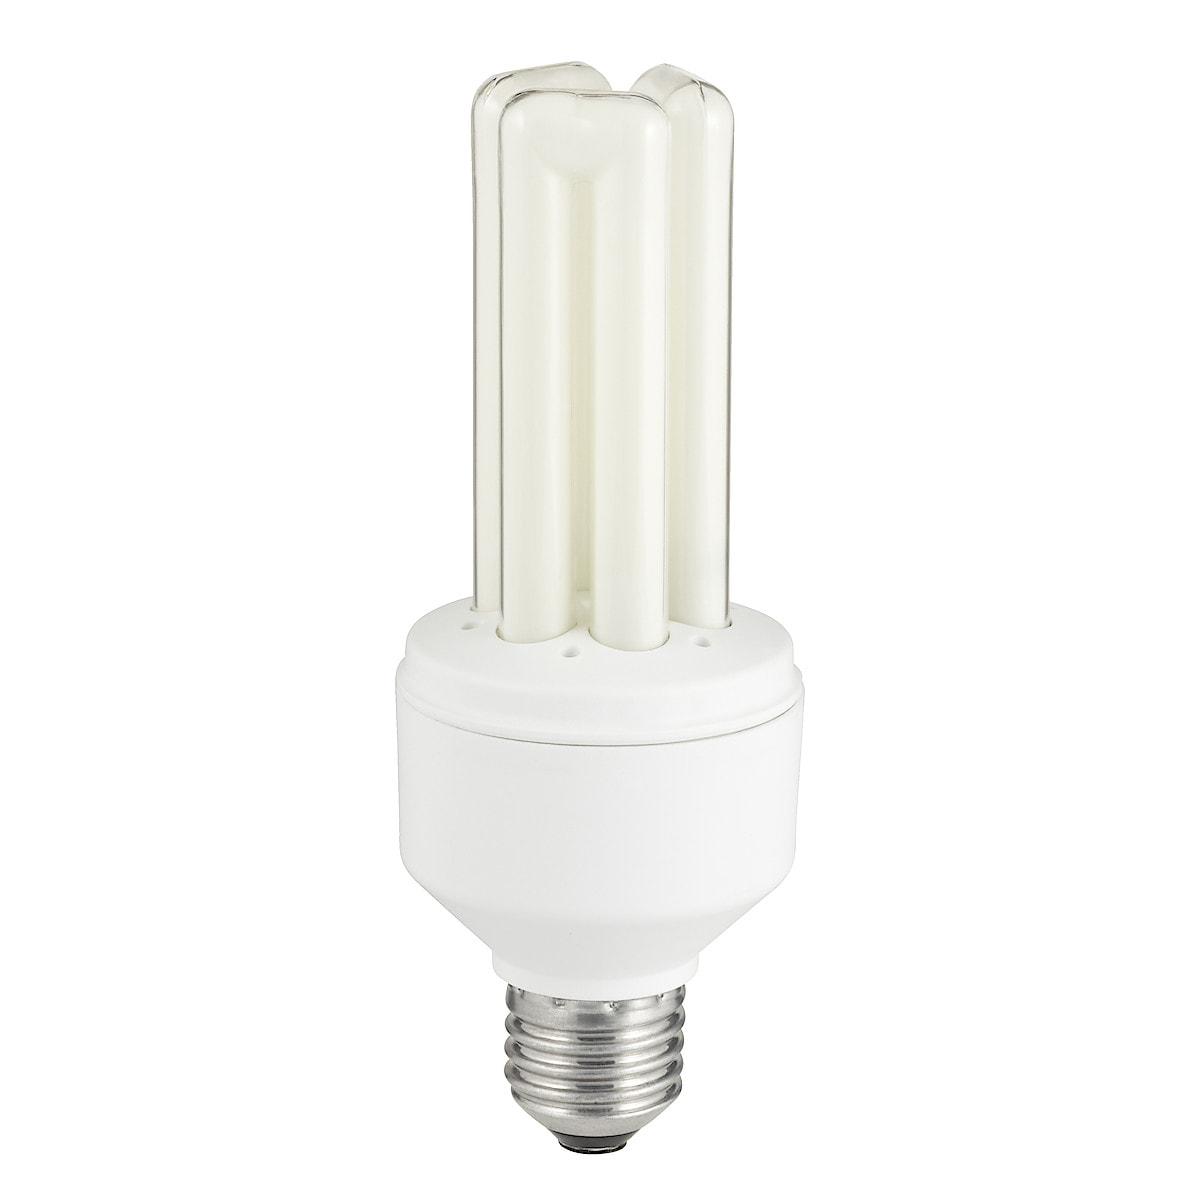 Osram Dulux Intelligent Dim Energy Saving Bulb